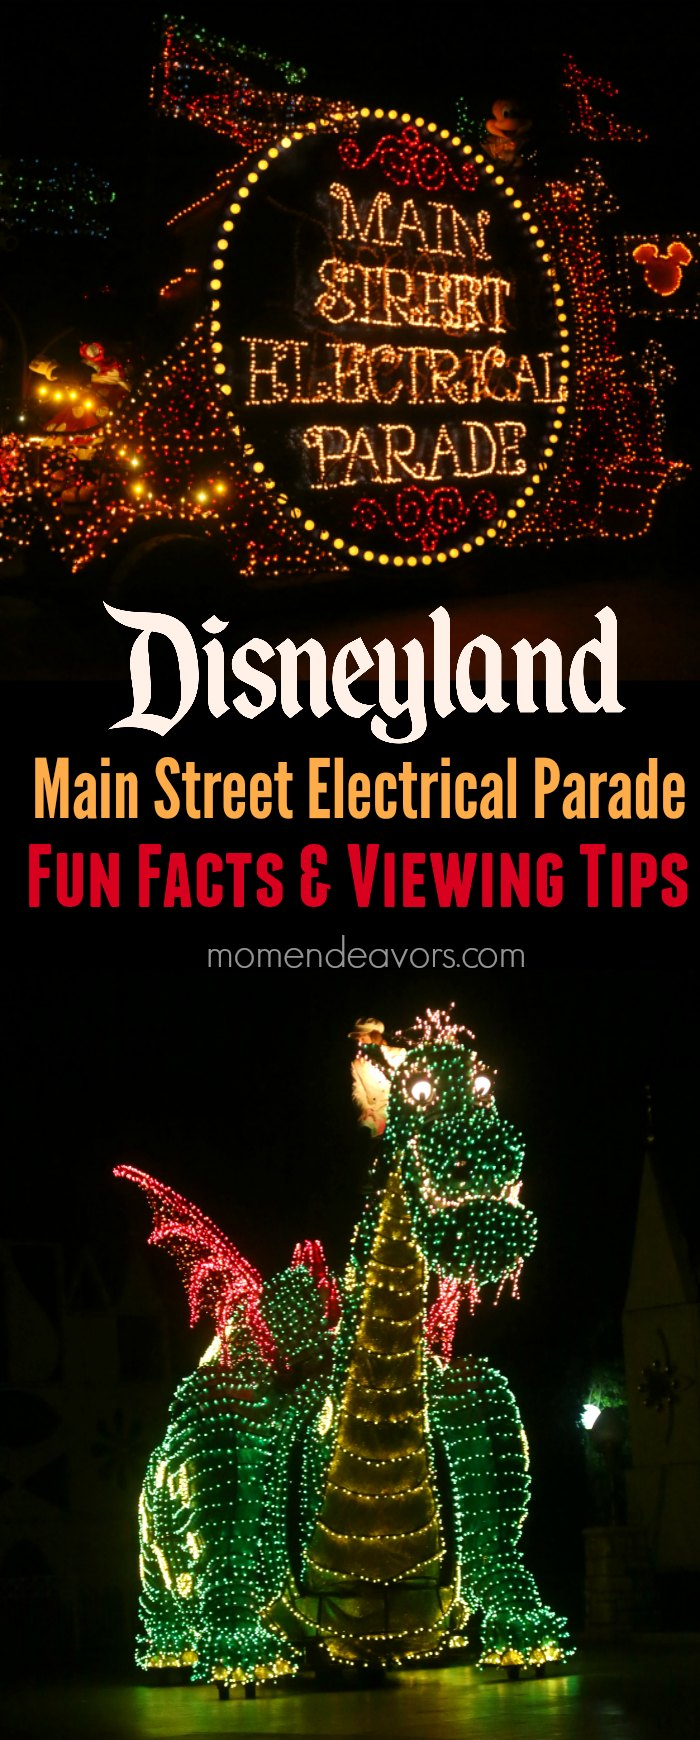 disneyland main street electrical parade fun facts viewing tips